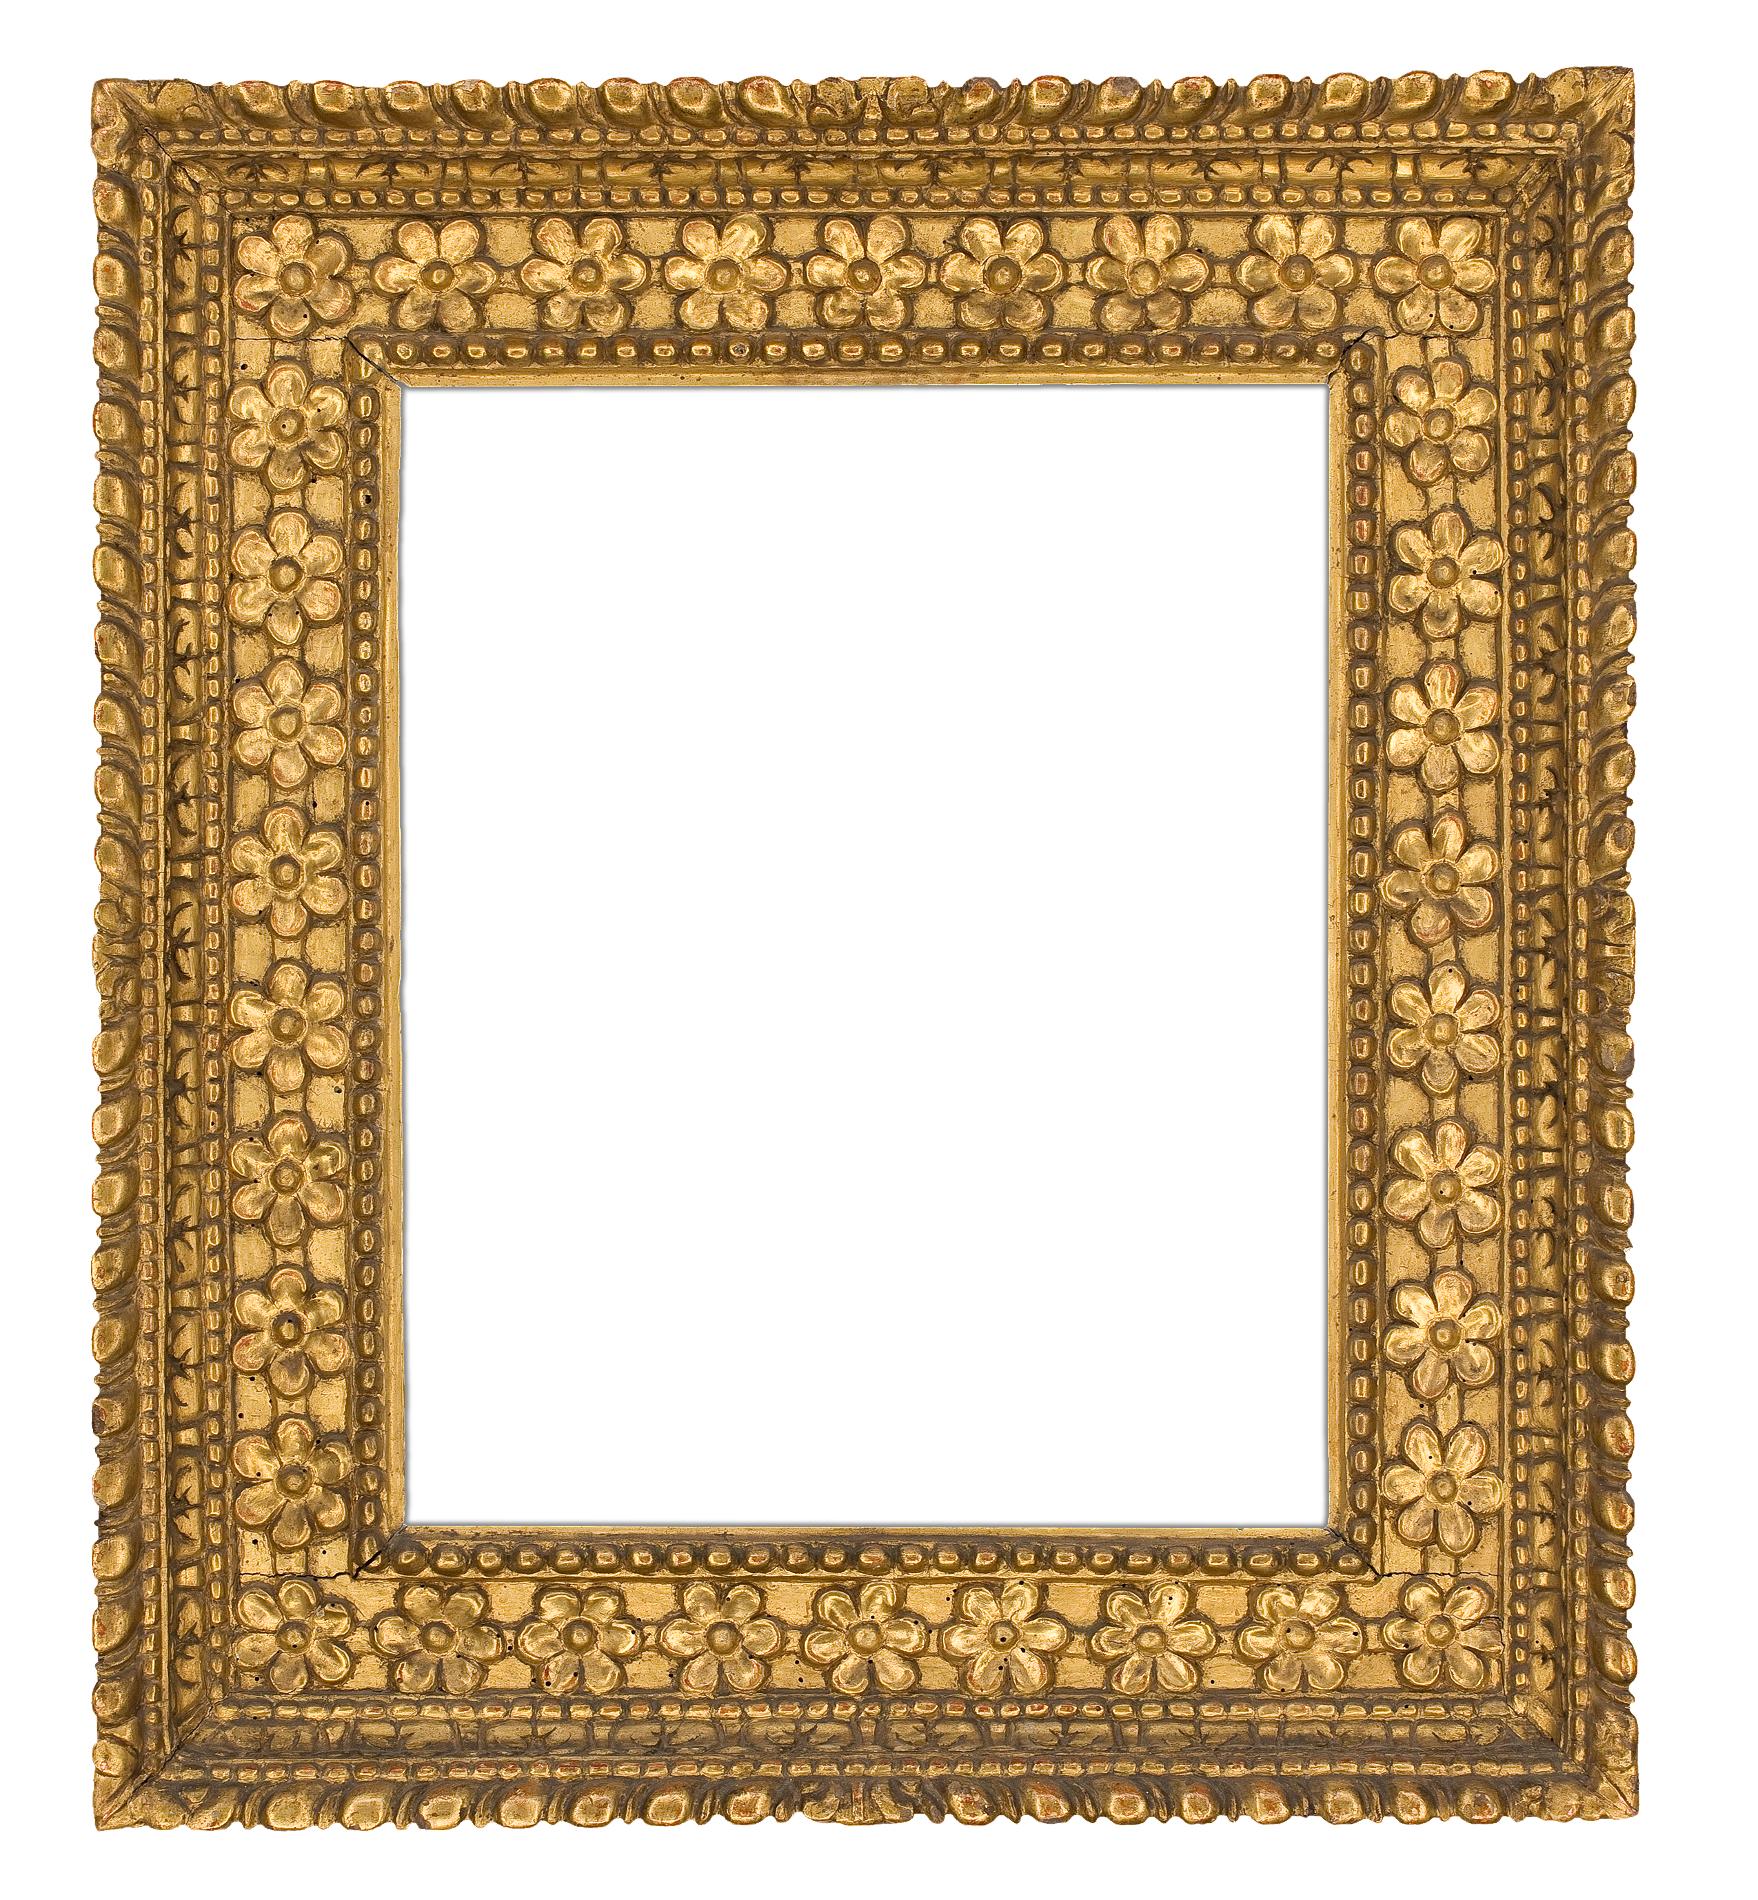 17th century frame